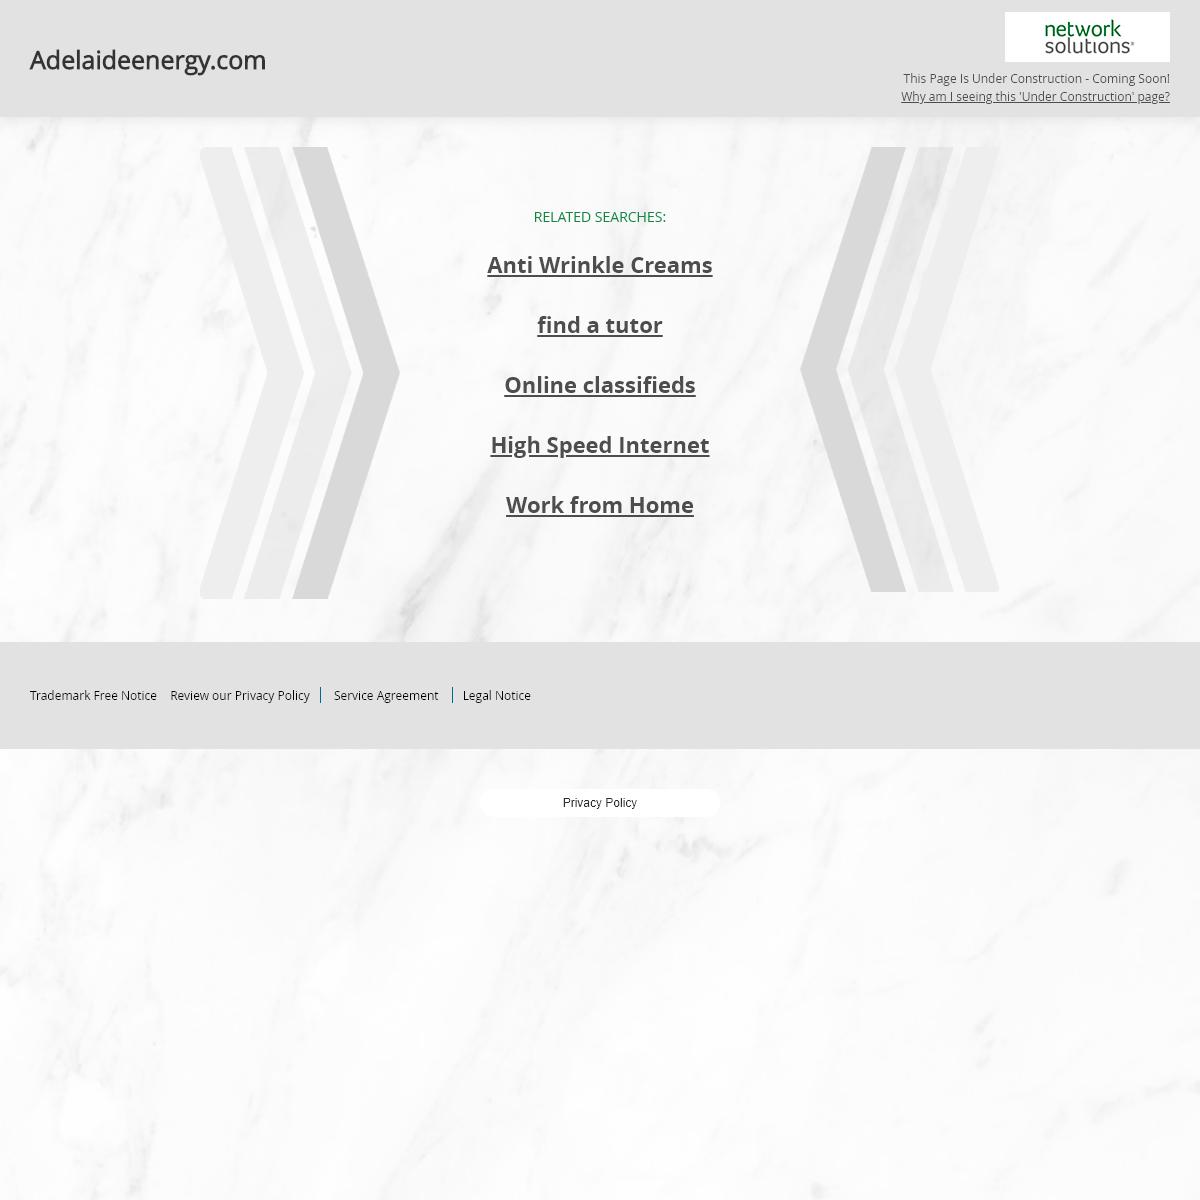 Adelaideenergy.com